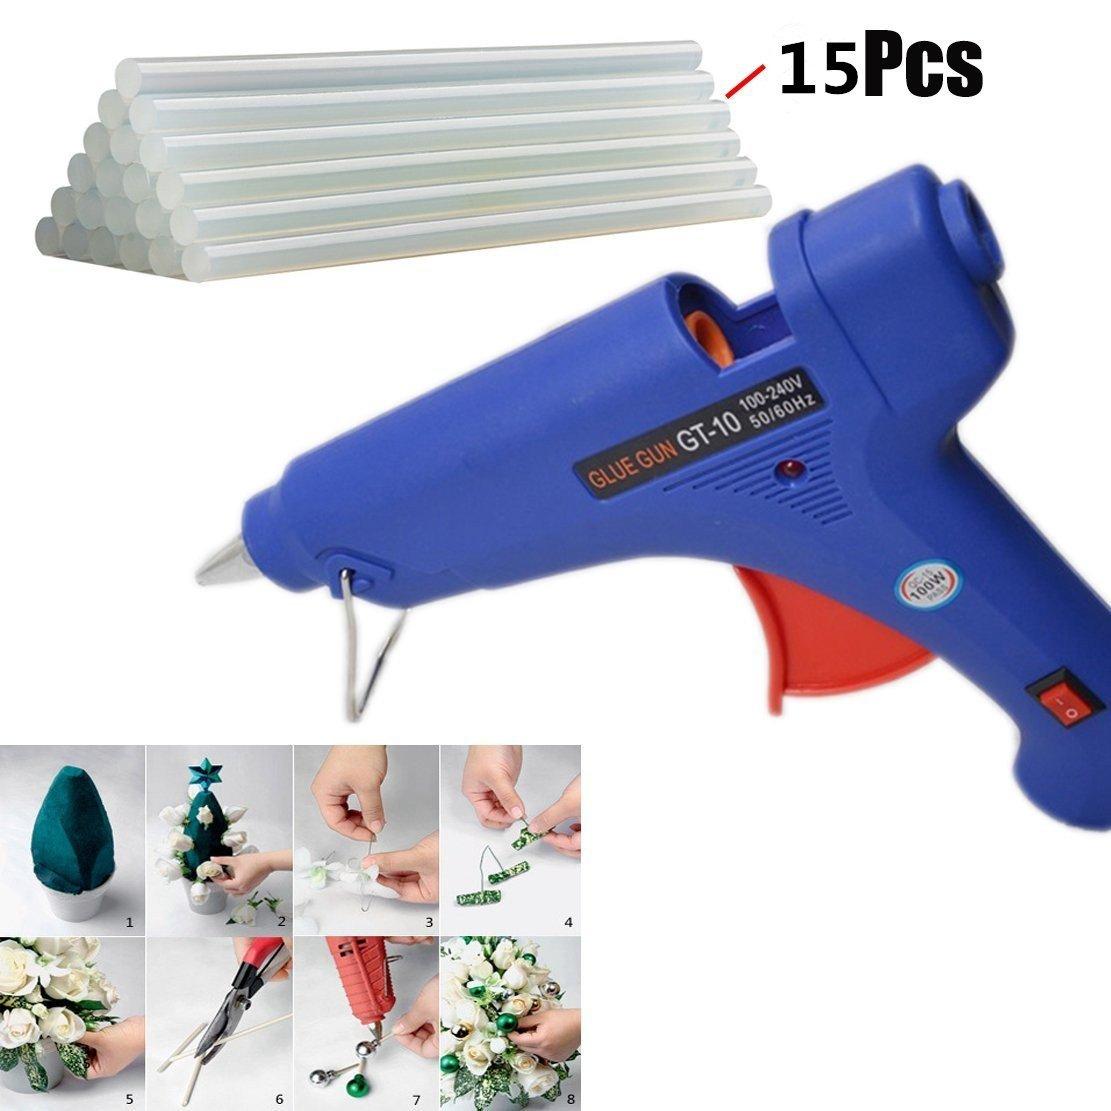 Hot Glue Gun, 100 Watt Hot Melt Glue Gun with 15PCS Transparent Glue Gun Sticks for Arts & Crafts, & Sealing and Quick Repairs,Blue